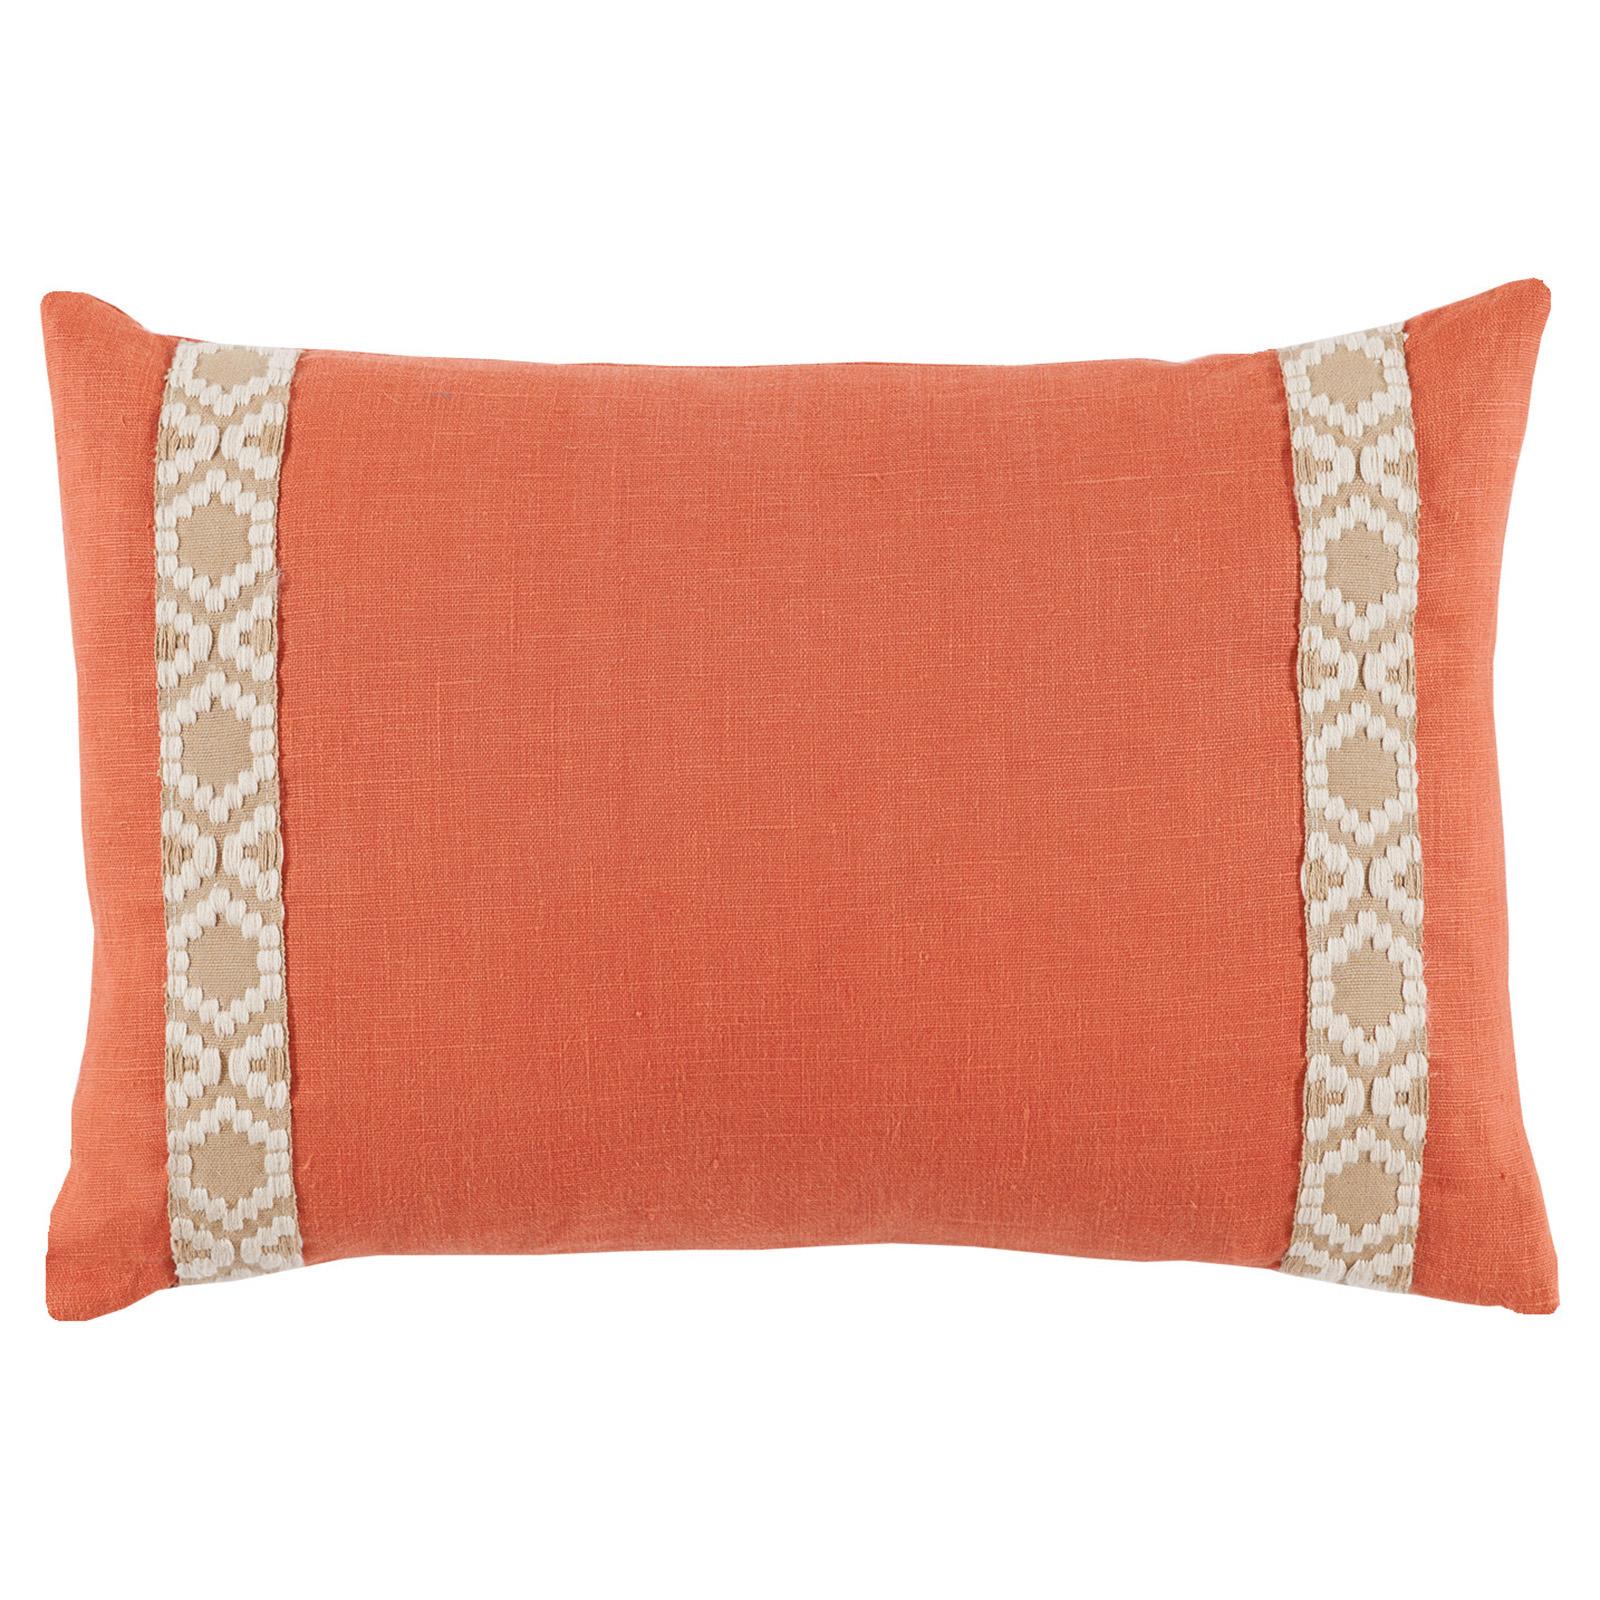 Kaia Global Orange Linen Trim Band Pillow - 13x19